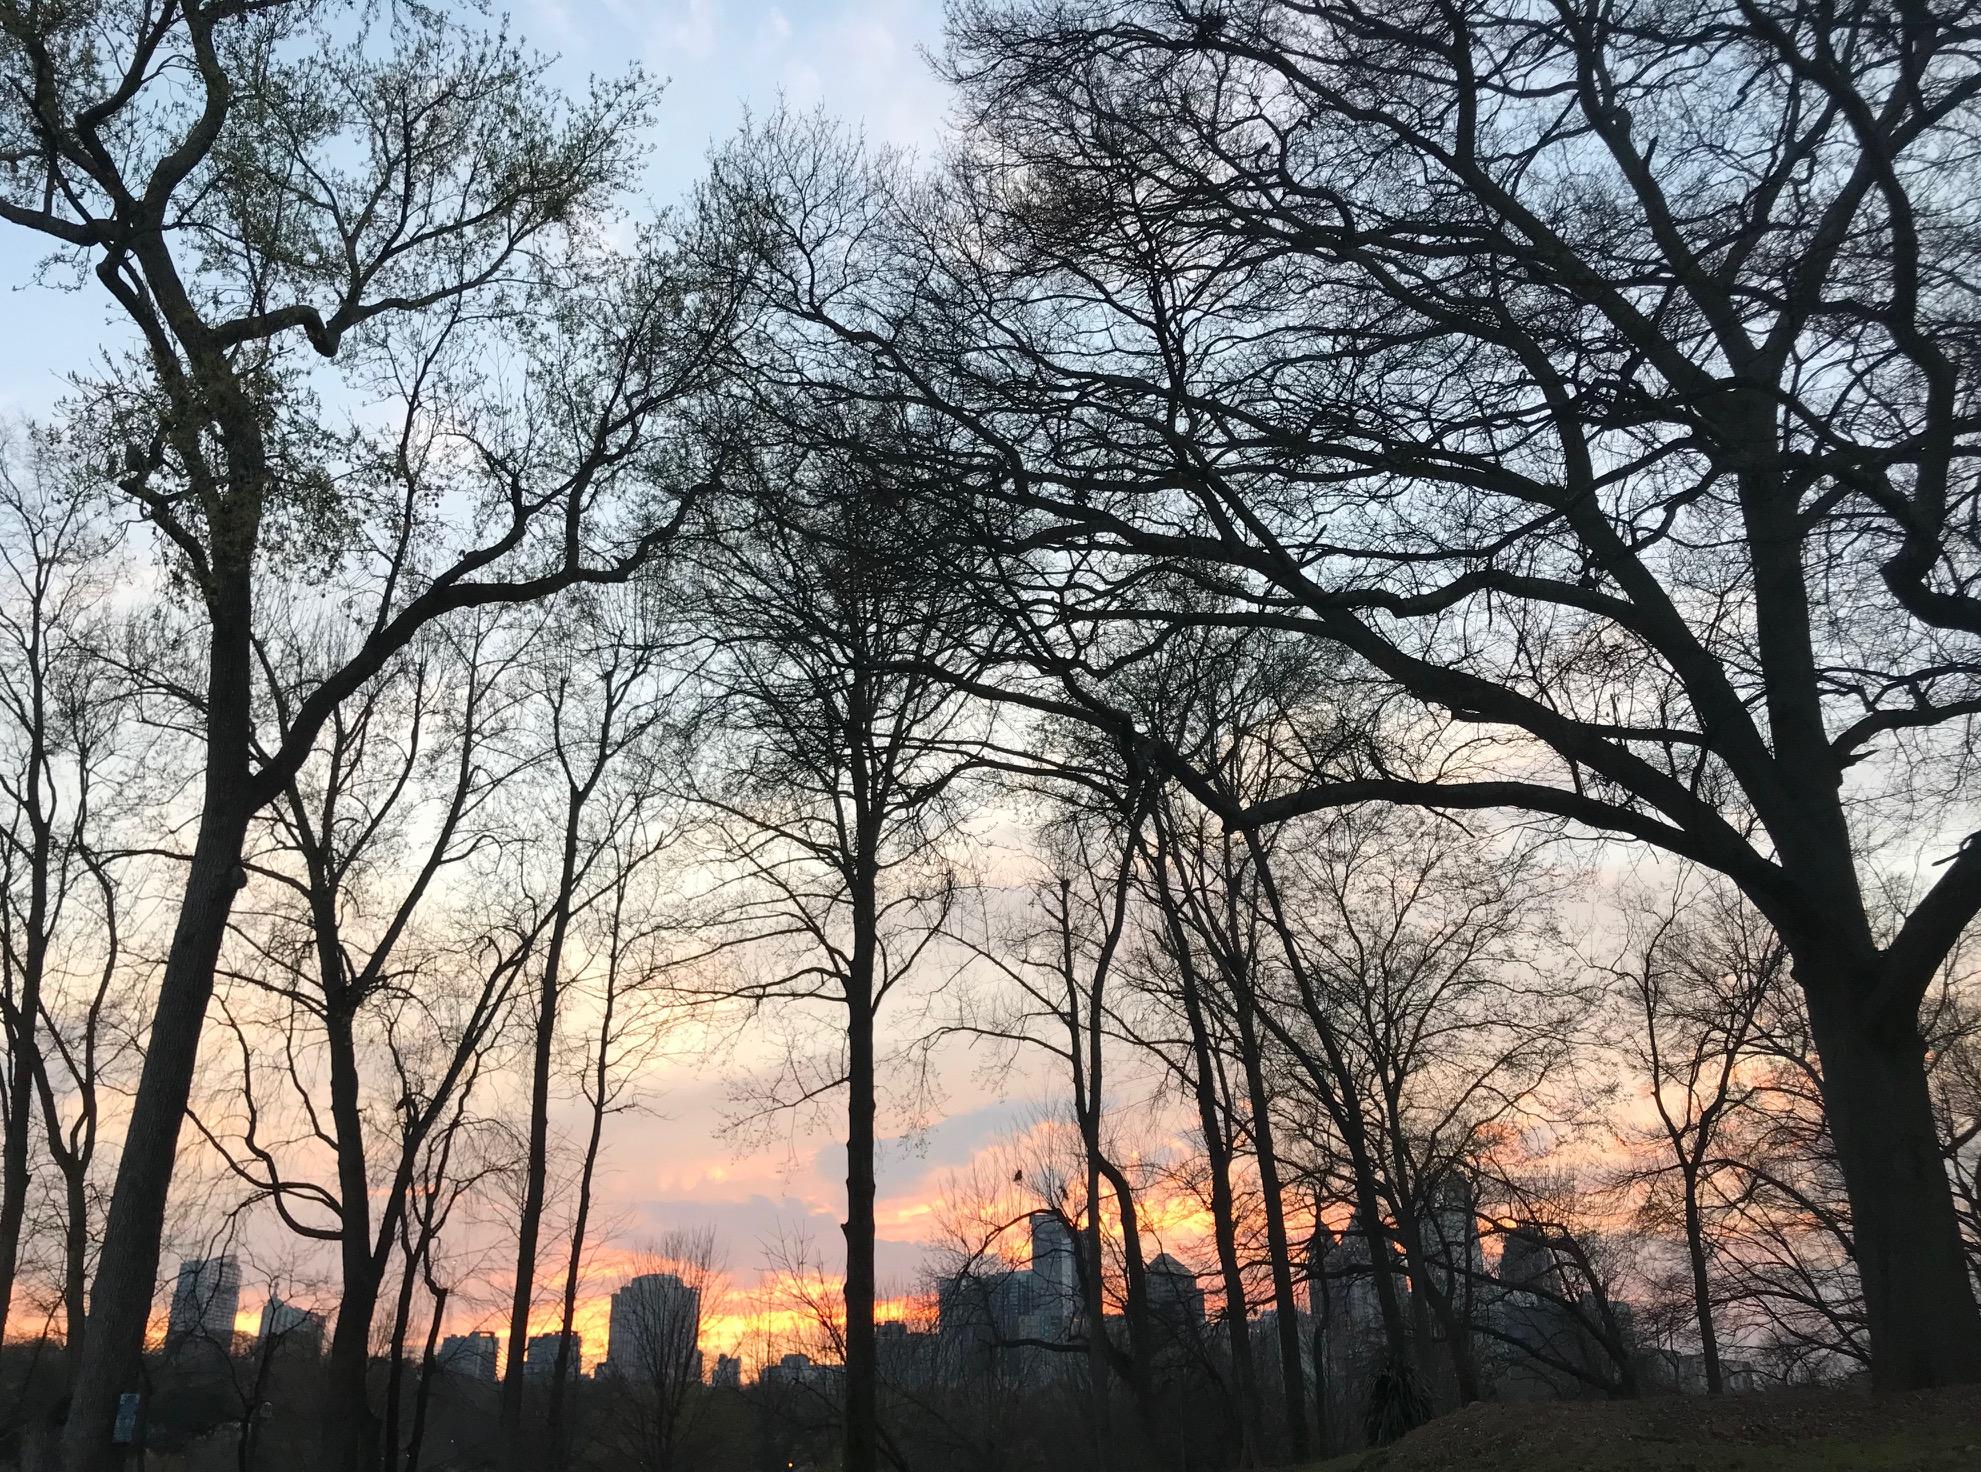 Piedmont Park perspectives by Kelly Jordan